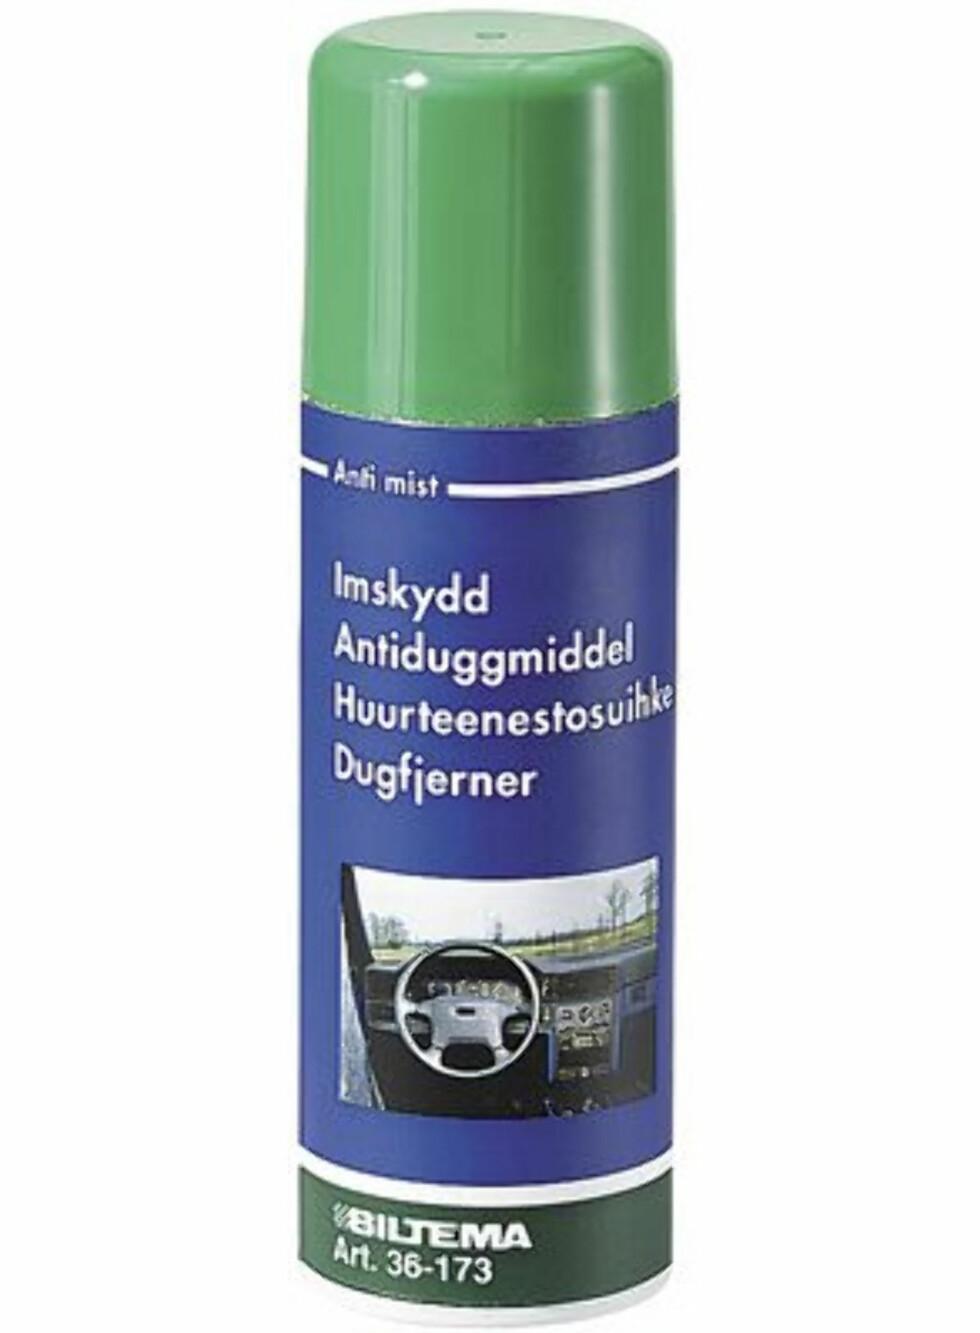 Antiduggmiddelet fra Biltema blir anbefalt på en rekke forum som en god løsning, også på badet. Pris: 49,90 kroner. Foto: Biltema.no